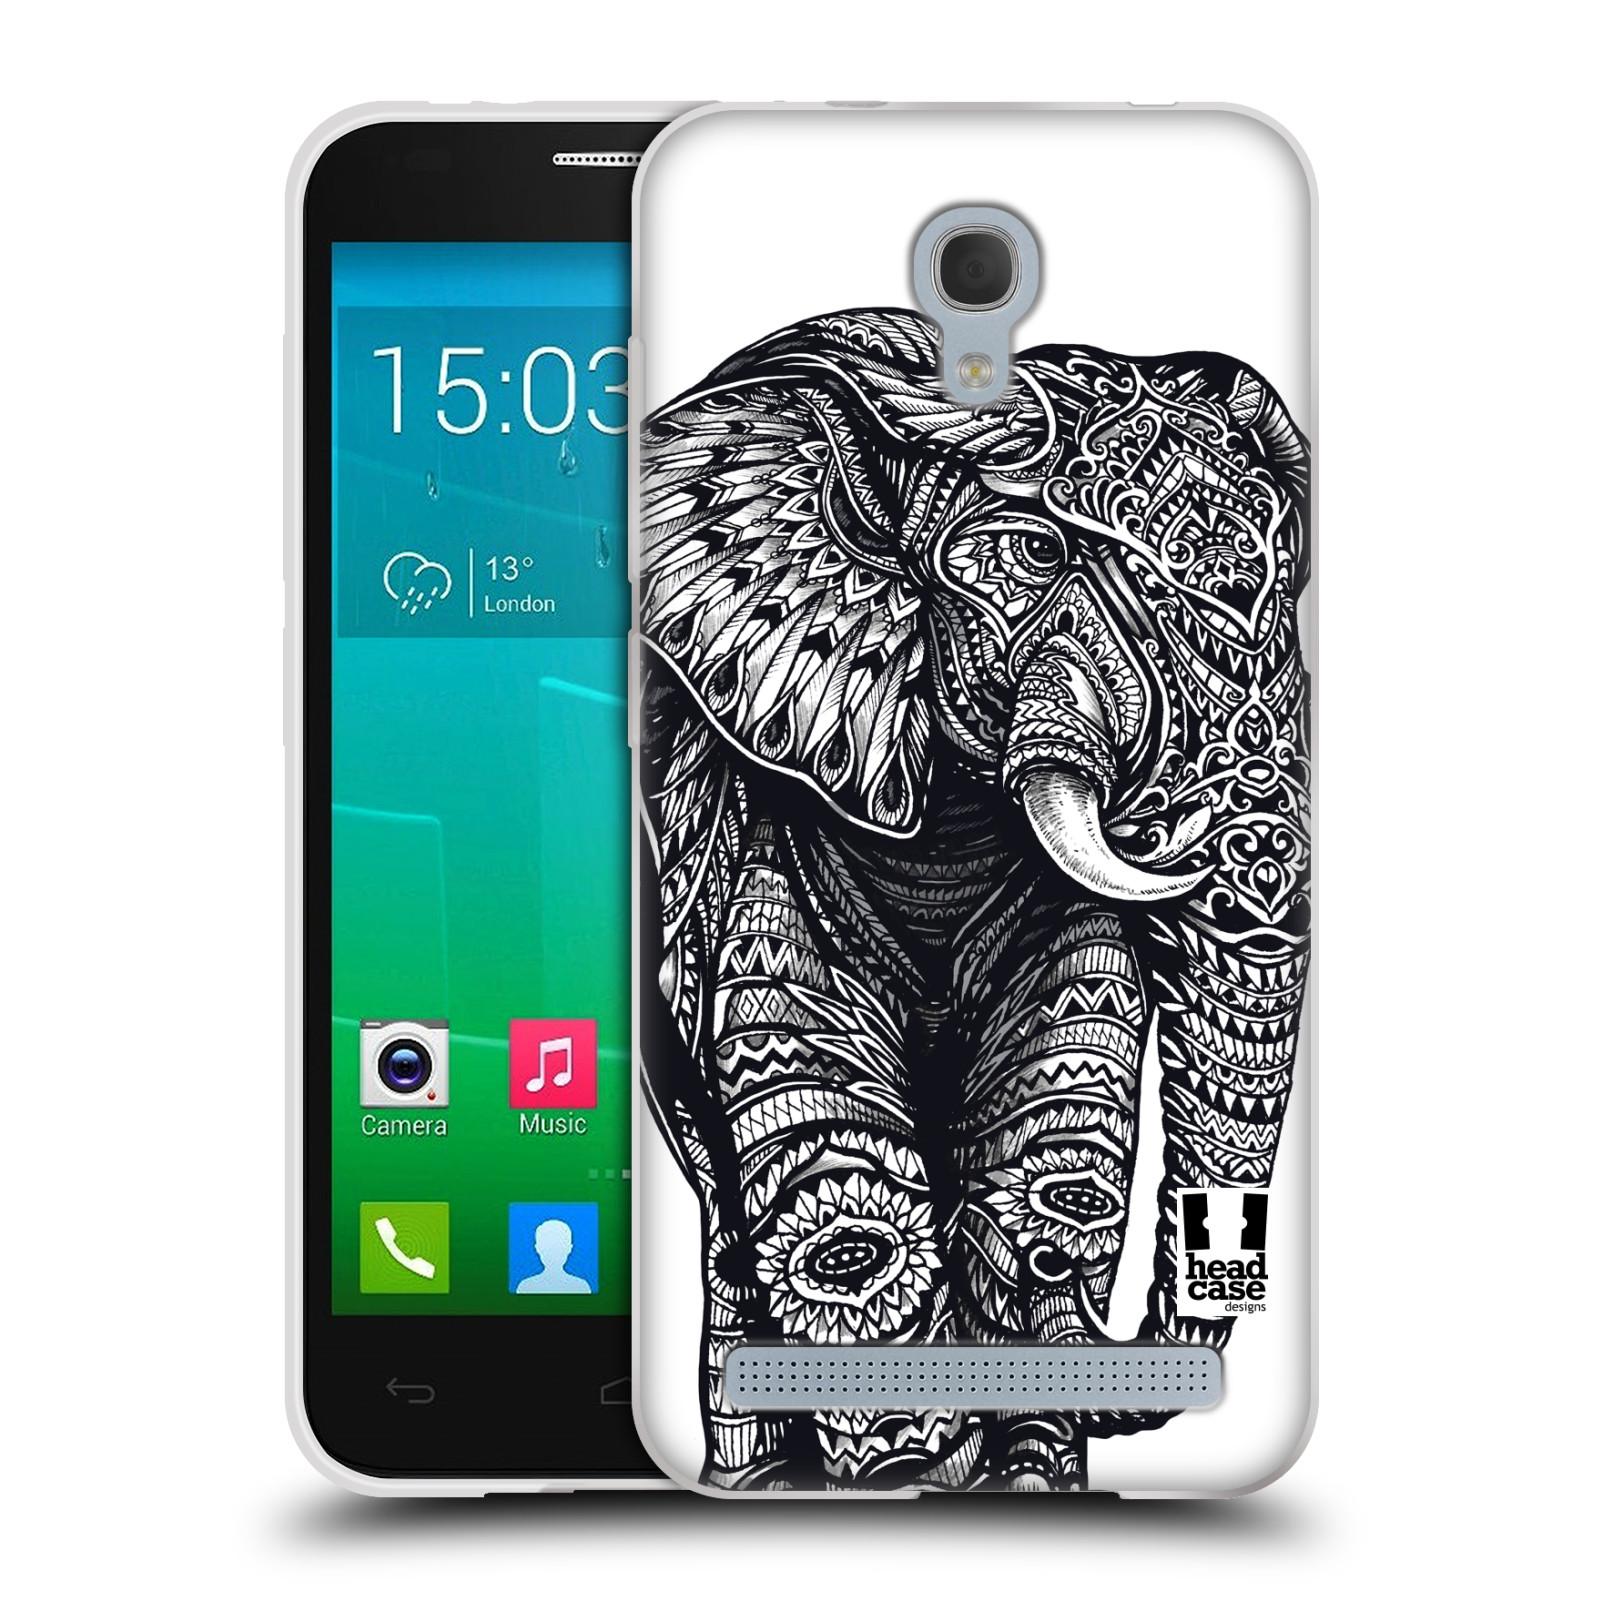 Silikonové pouzdro na mobil Alcatel One Touch Idol 2 Mini S 6036Y HEAD CASE Zdobený Slon (Silikonový kryt či obal na mobilní telefon Alcatel Idol 2 Mini S OT-6036Y)